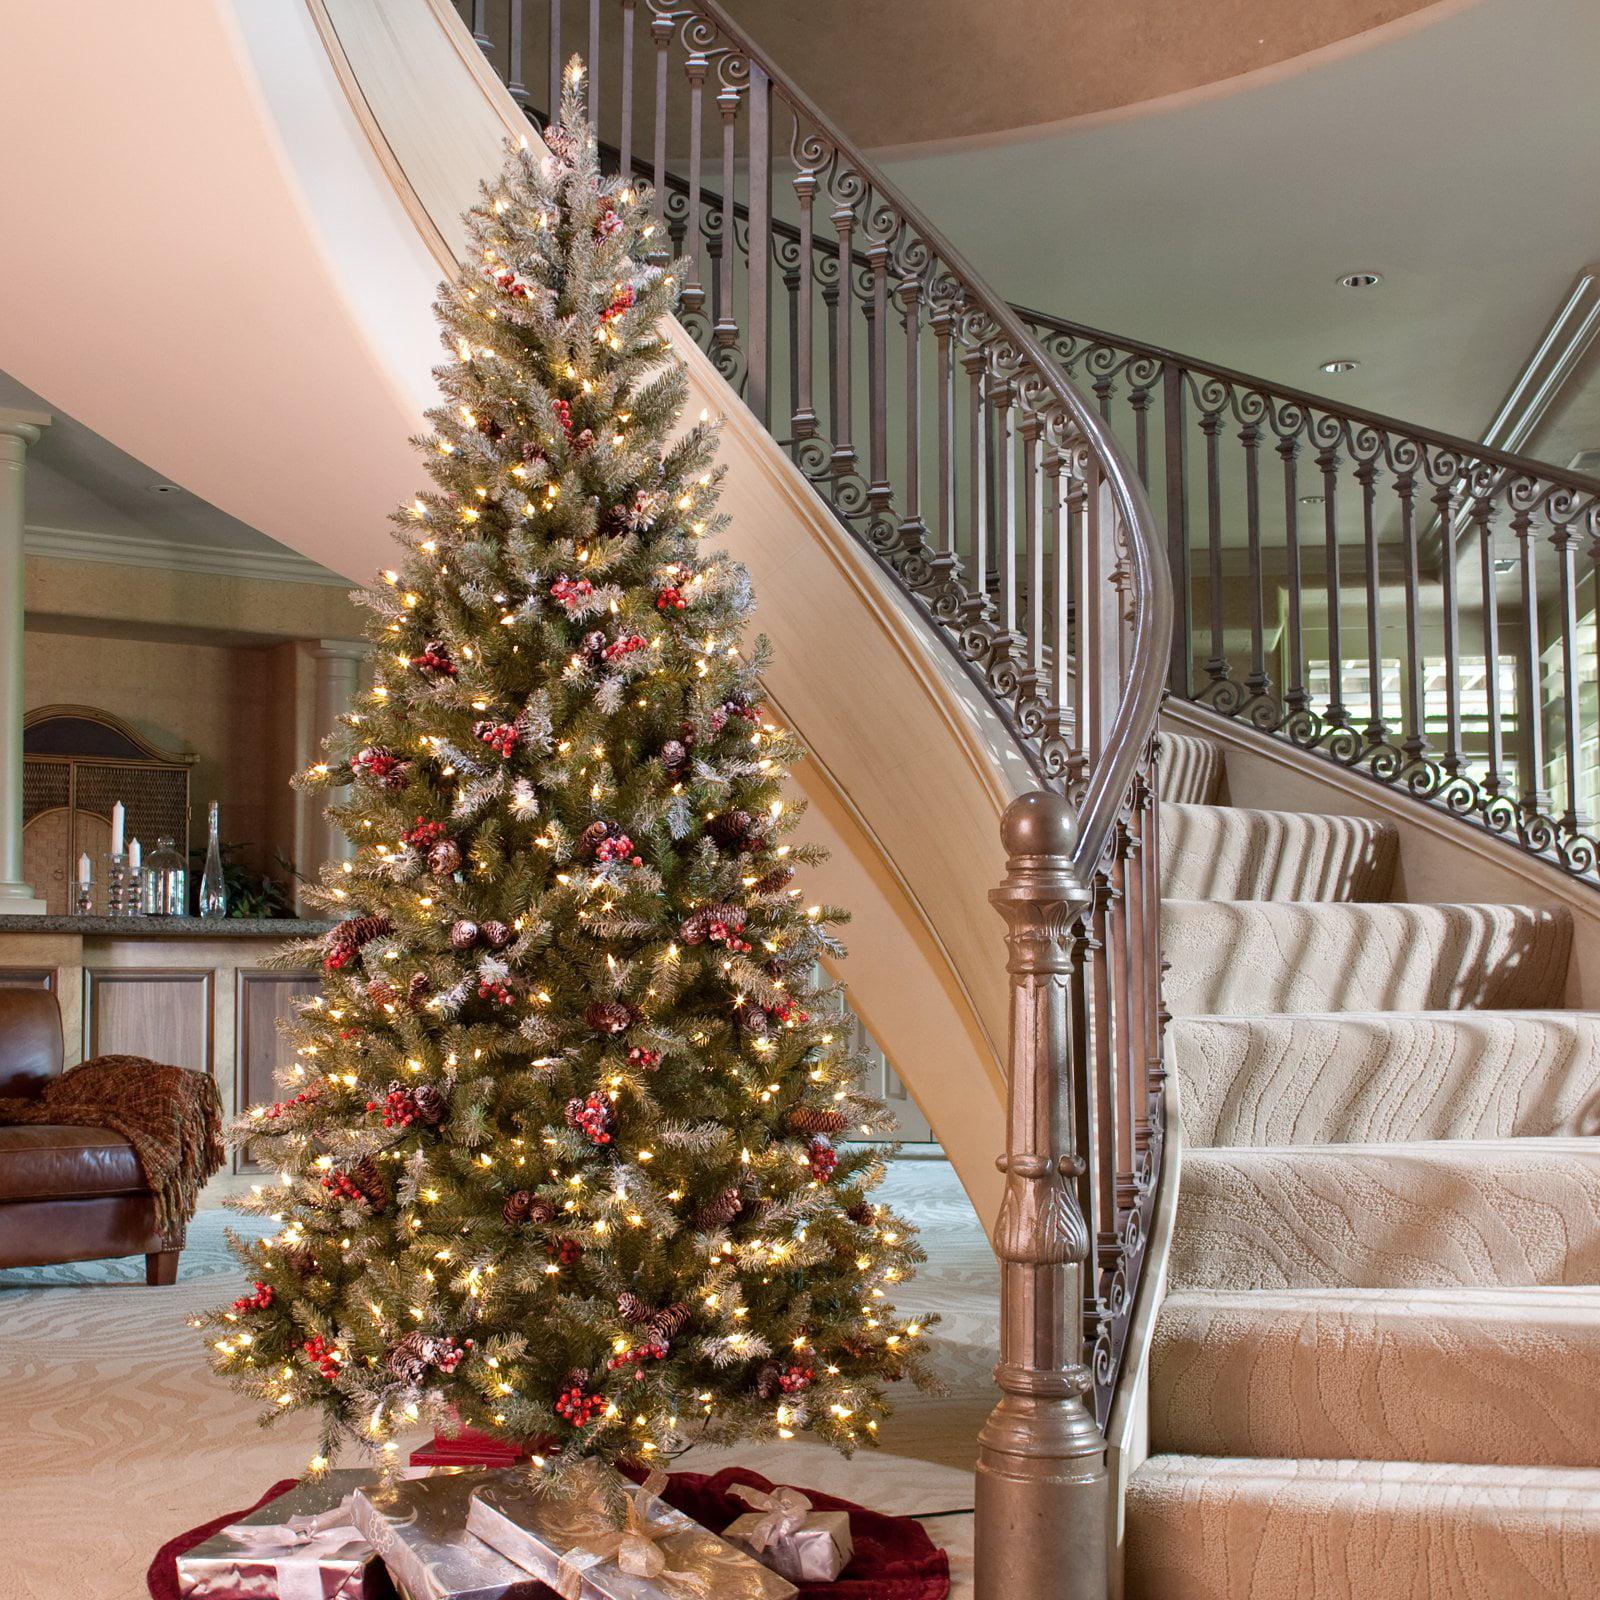 7 5 Ft Snowy Dunhill Slim Pre Lit Christmas Tree